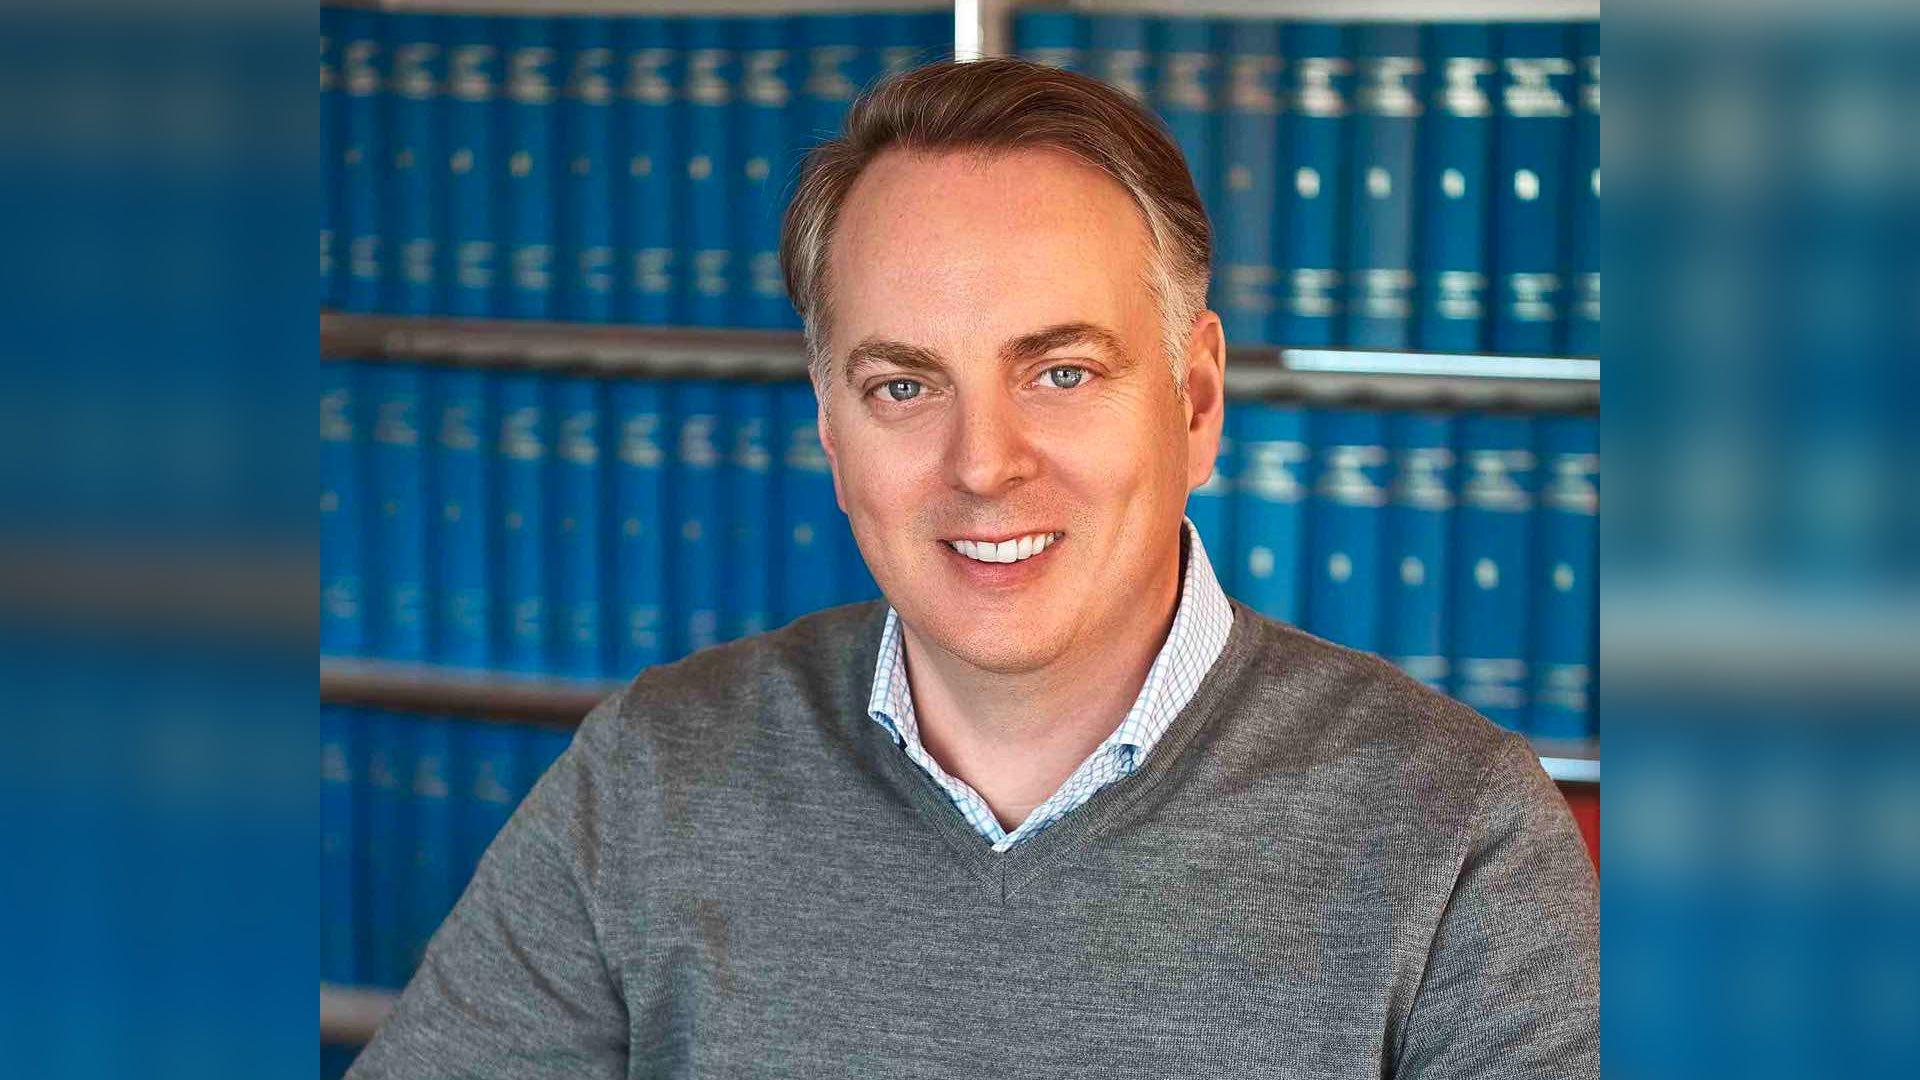 peter lohmann